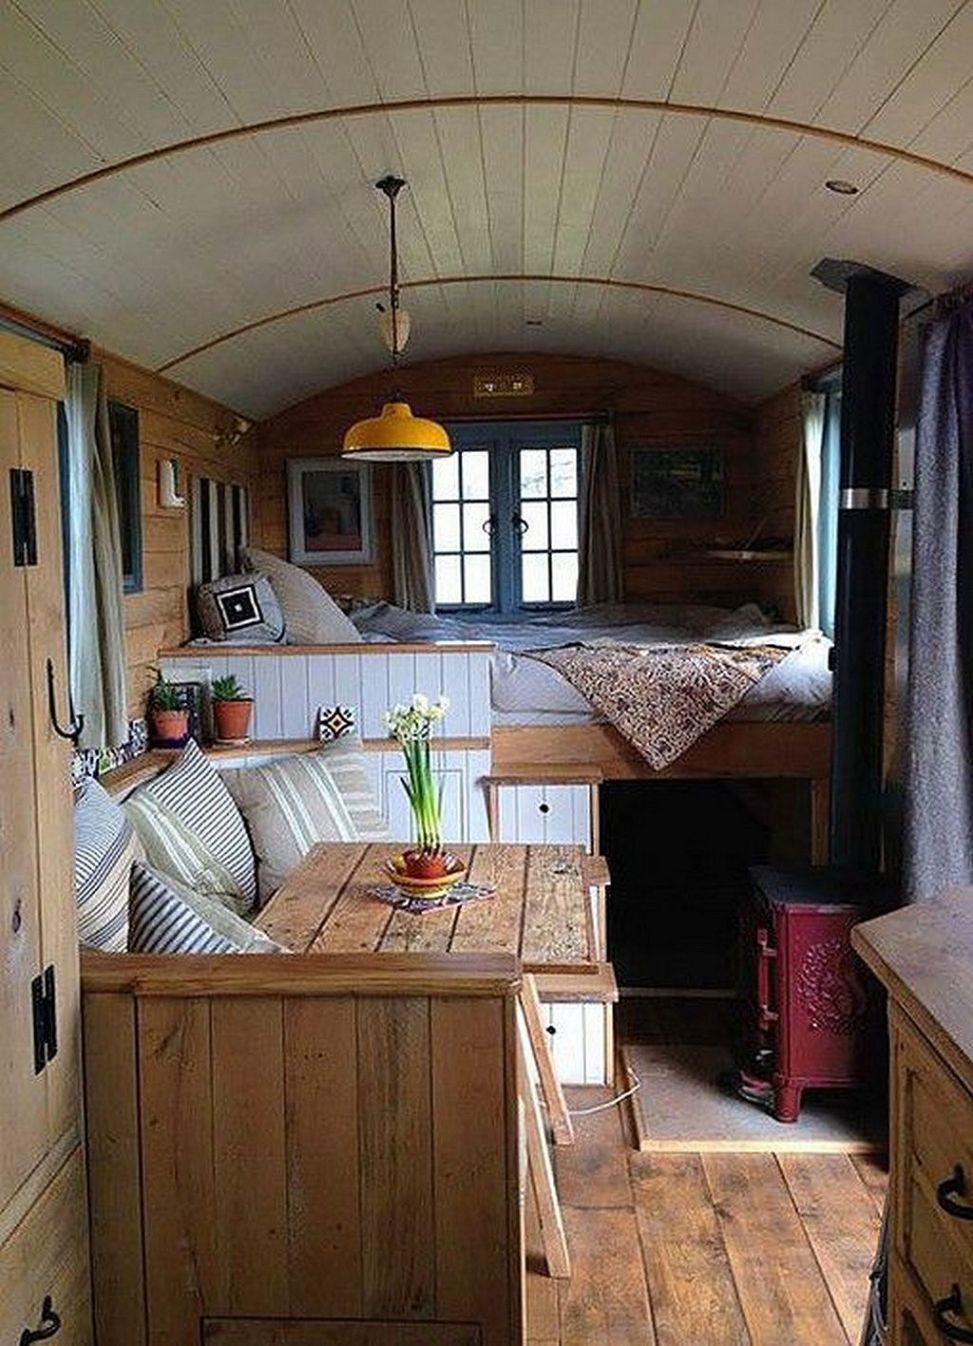 Interior design ideas for camper van 11   FreedoME   Camper ...